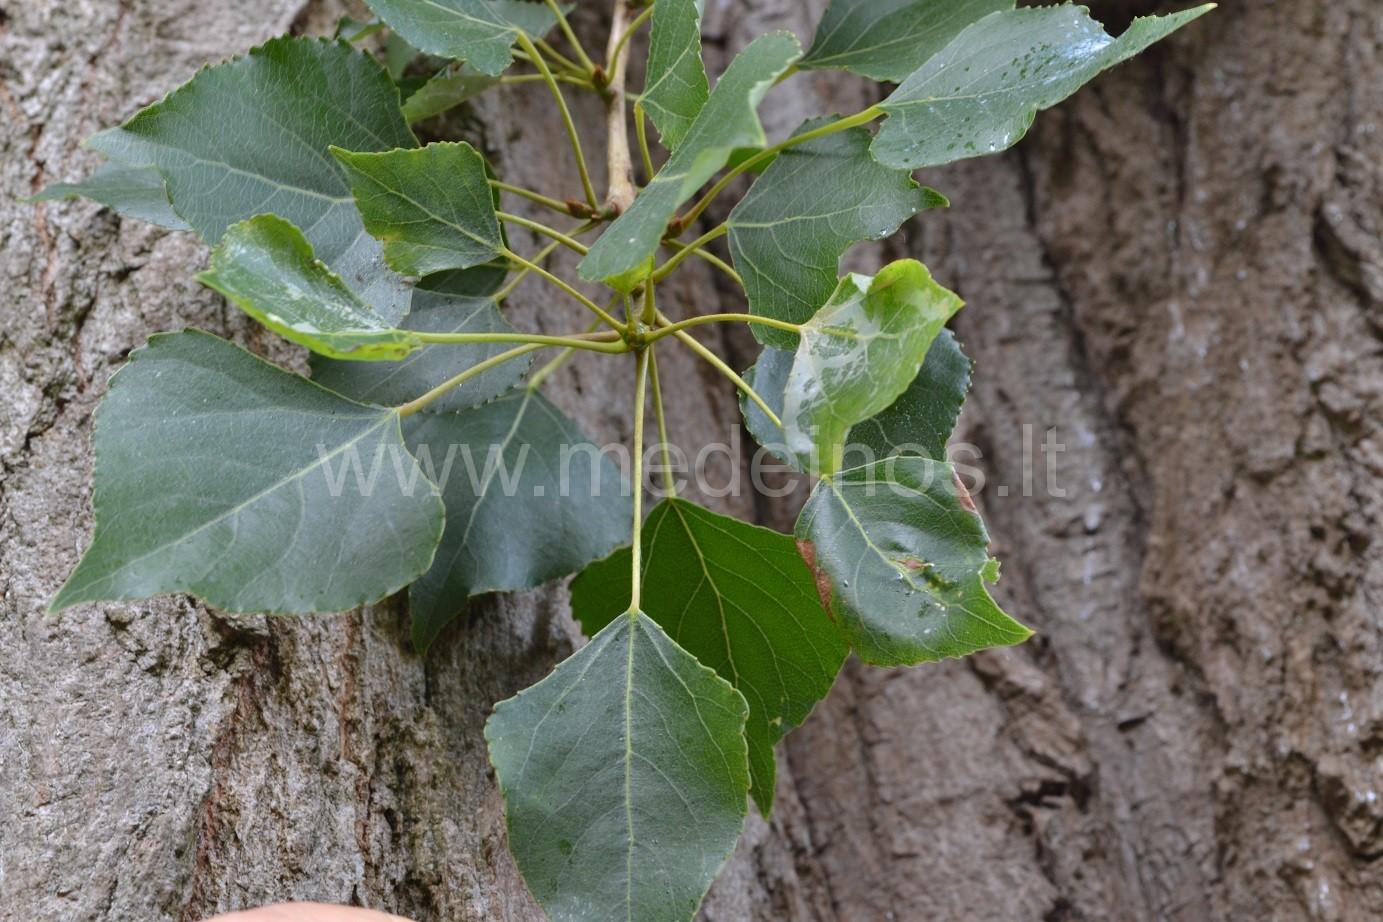 Juodoji tuopa (Populus nigra)